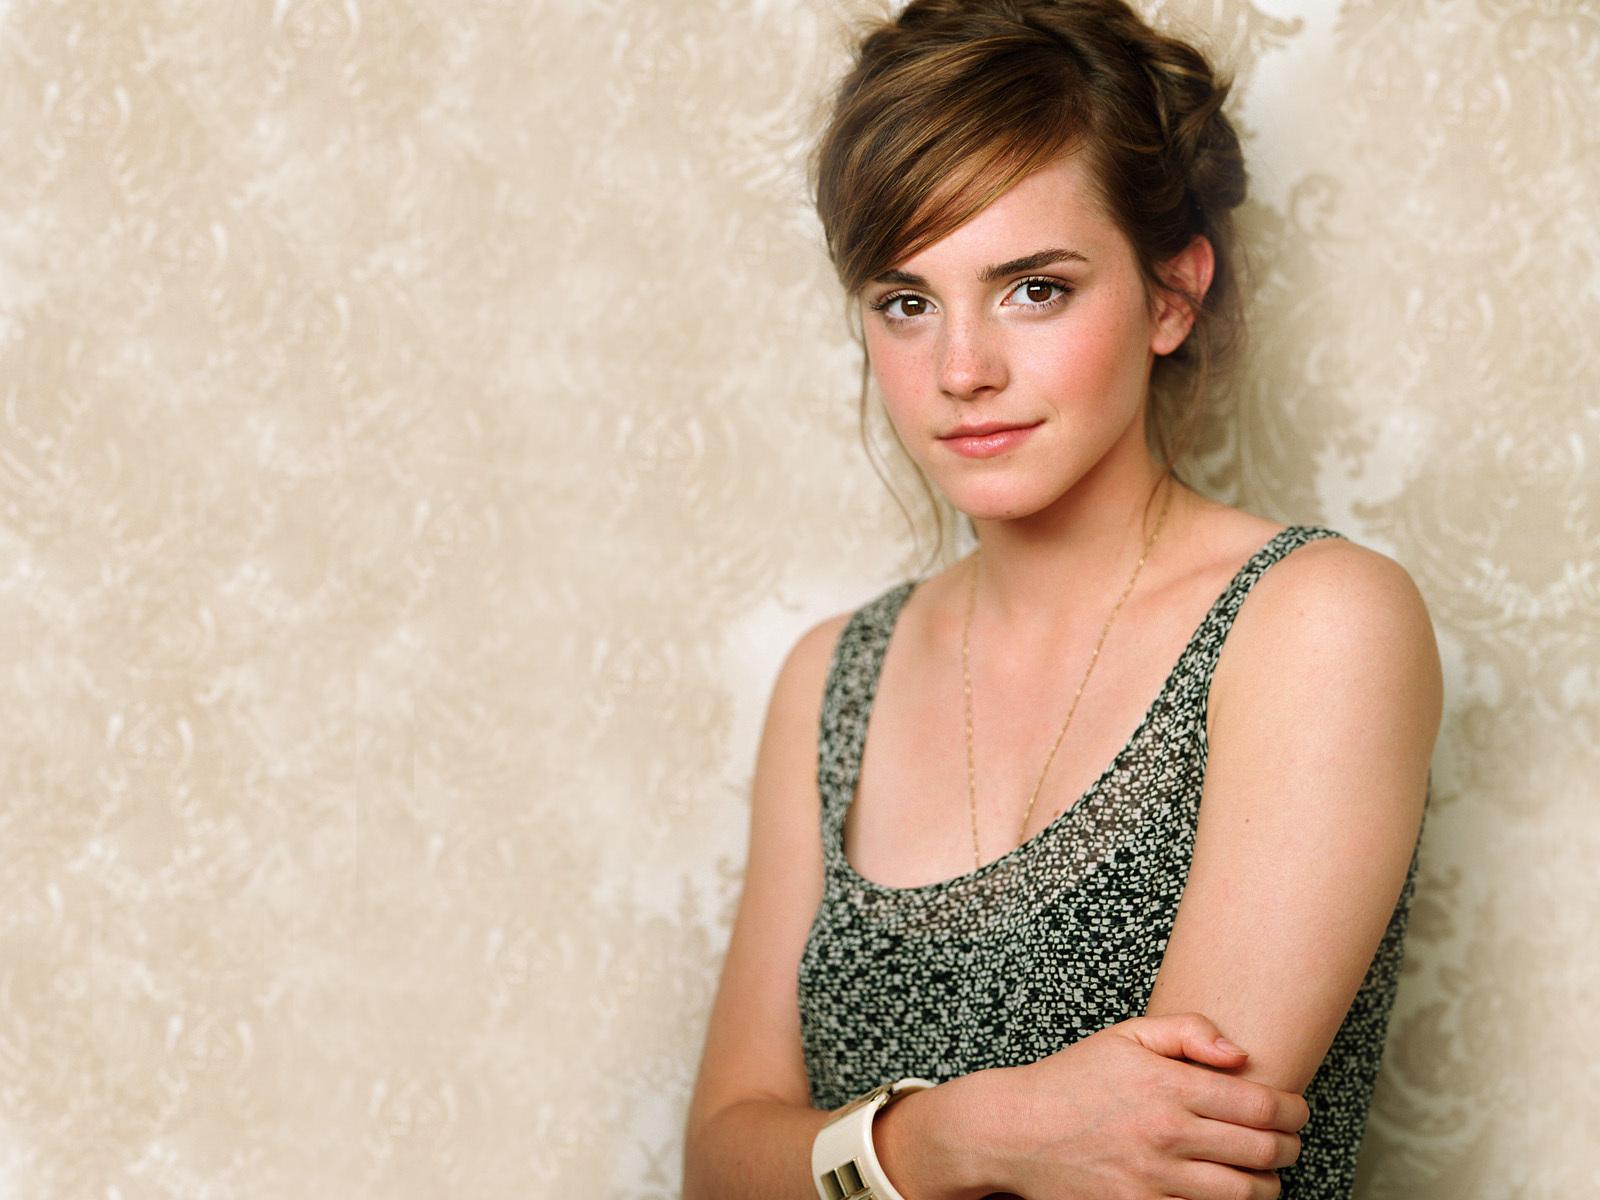 Emma Watson Latest Hd Wallpapers 2013 World Celebrities 1600x1200